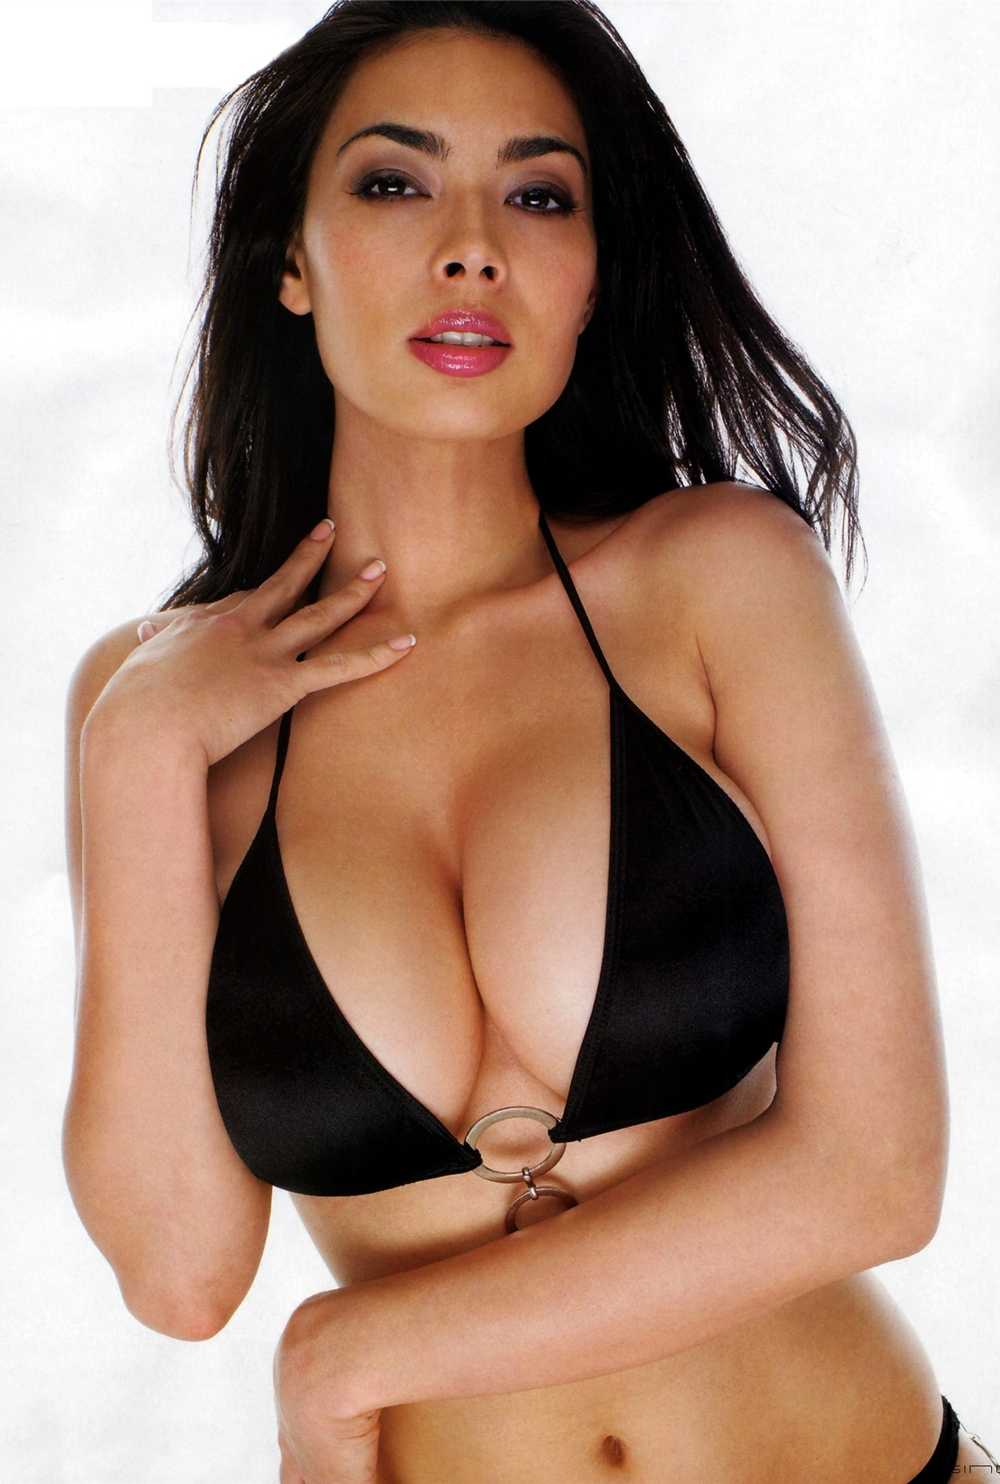 Tera Patrick amazing tits pics